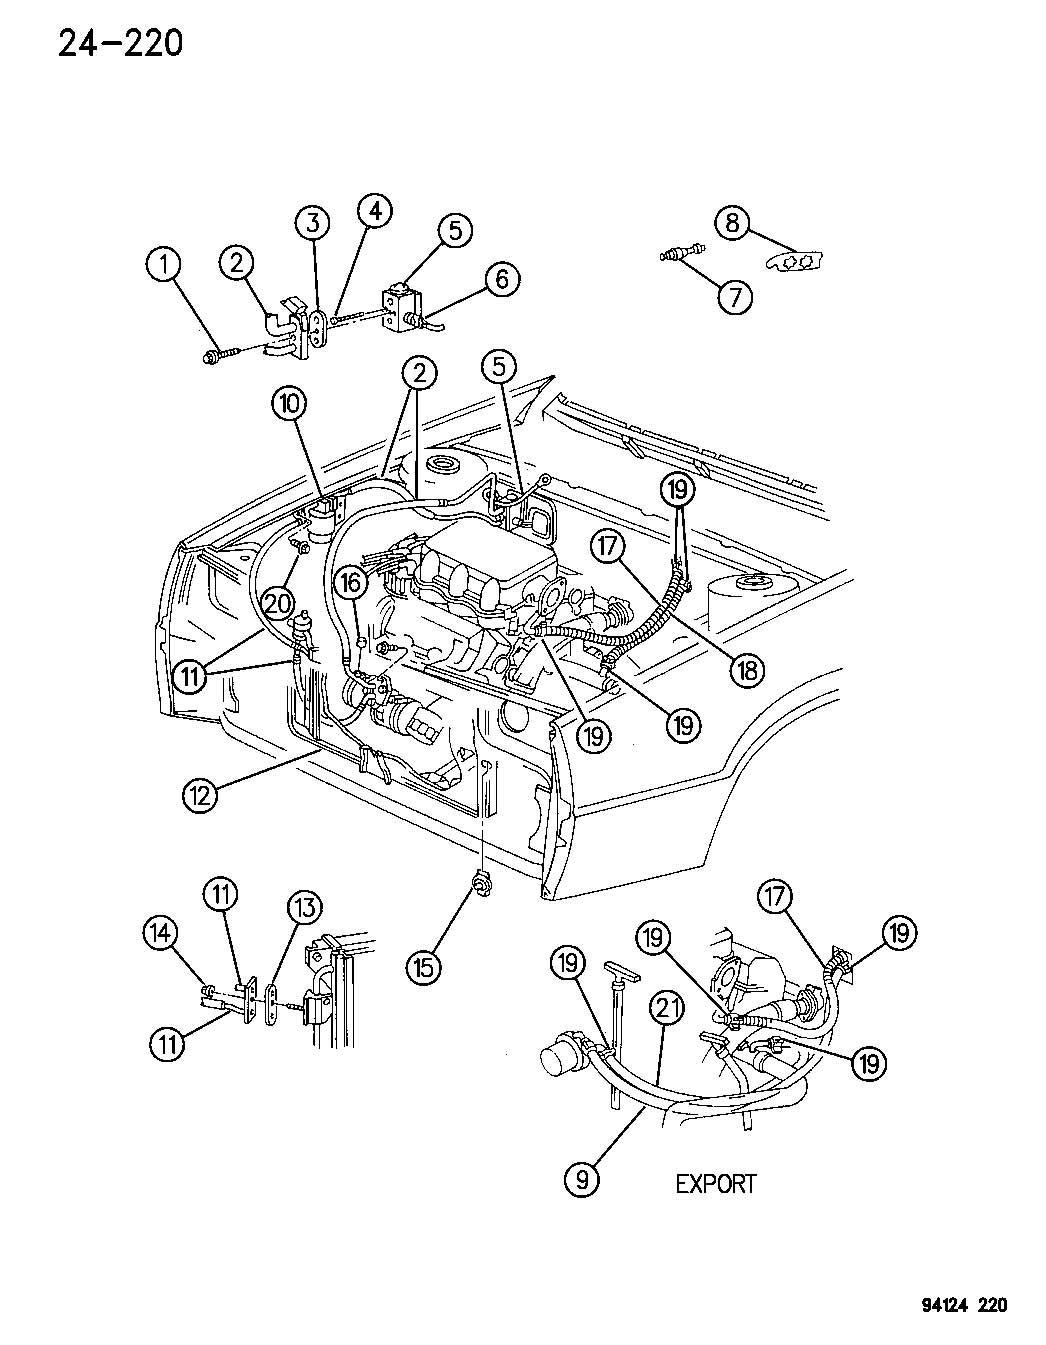 Dodge Neon Valve. A/c expansion. Abody, illustrations